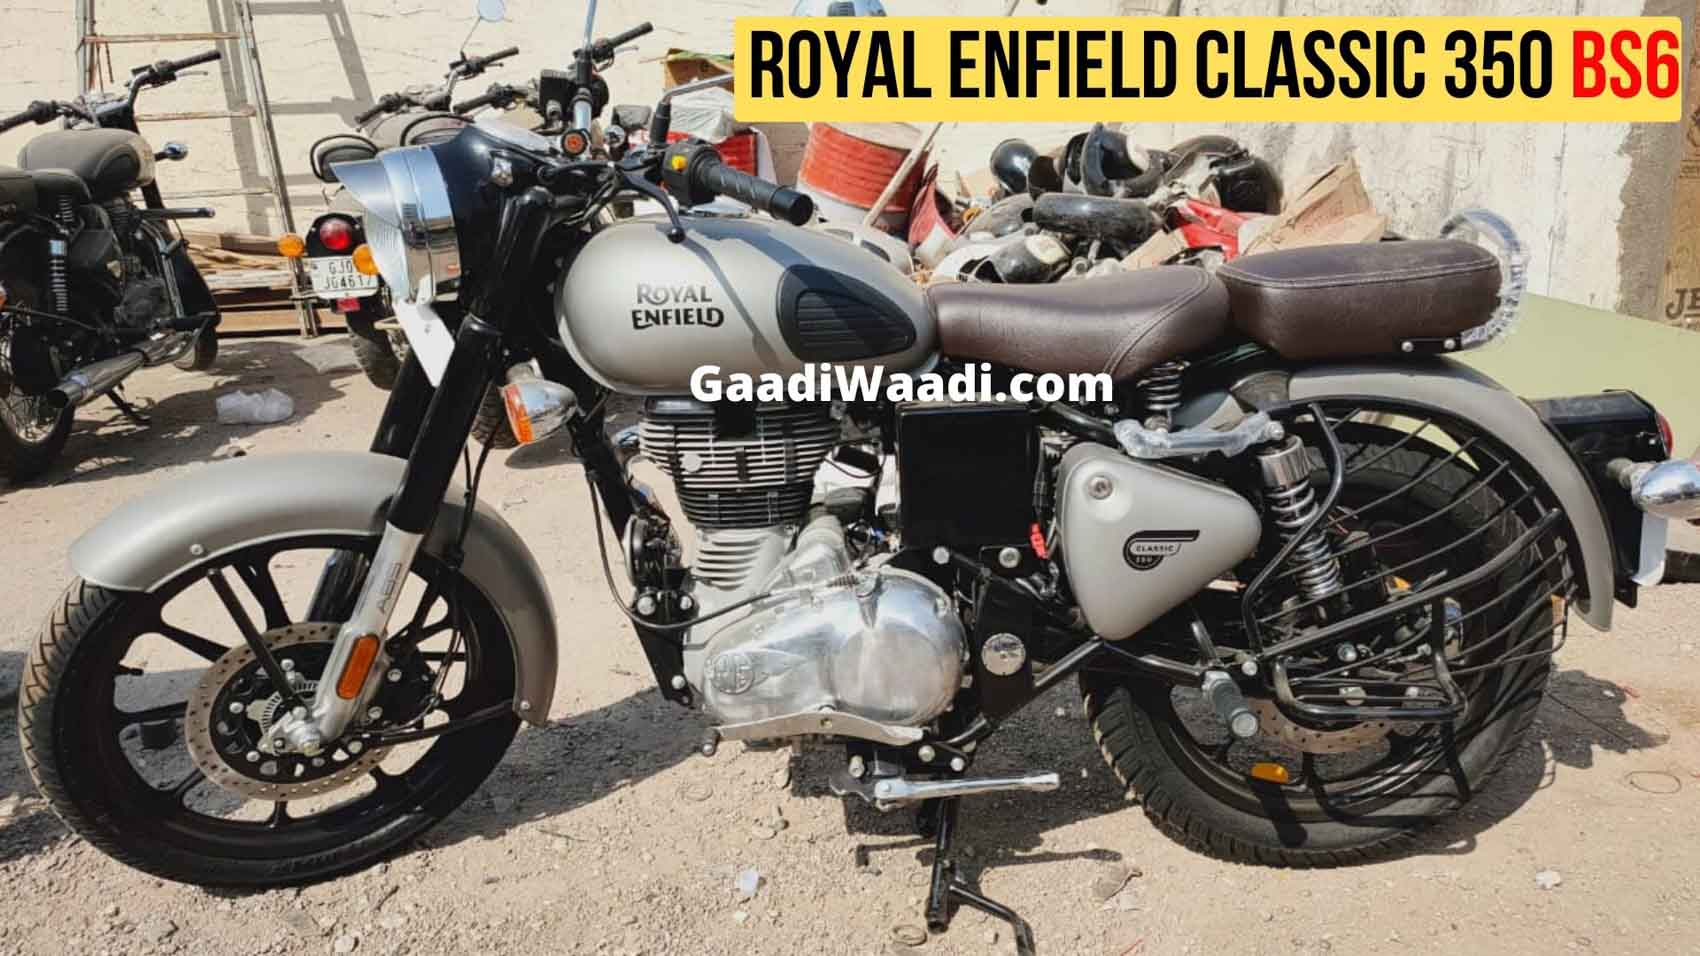 2020 Royal Enfield Classic 350 Bs6 Gunmetal Grey Bs6 Royal Enfield Classic 1700x956 Wallpaper Teahub Io